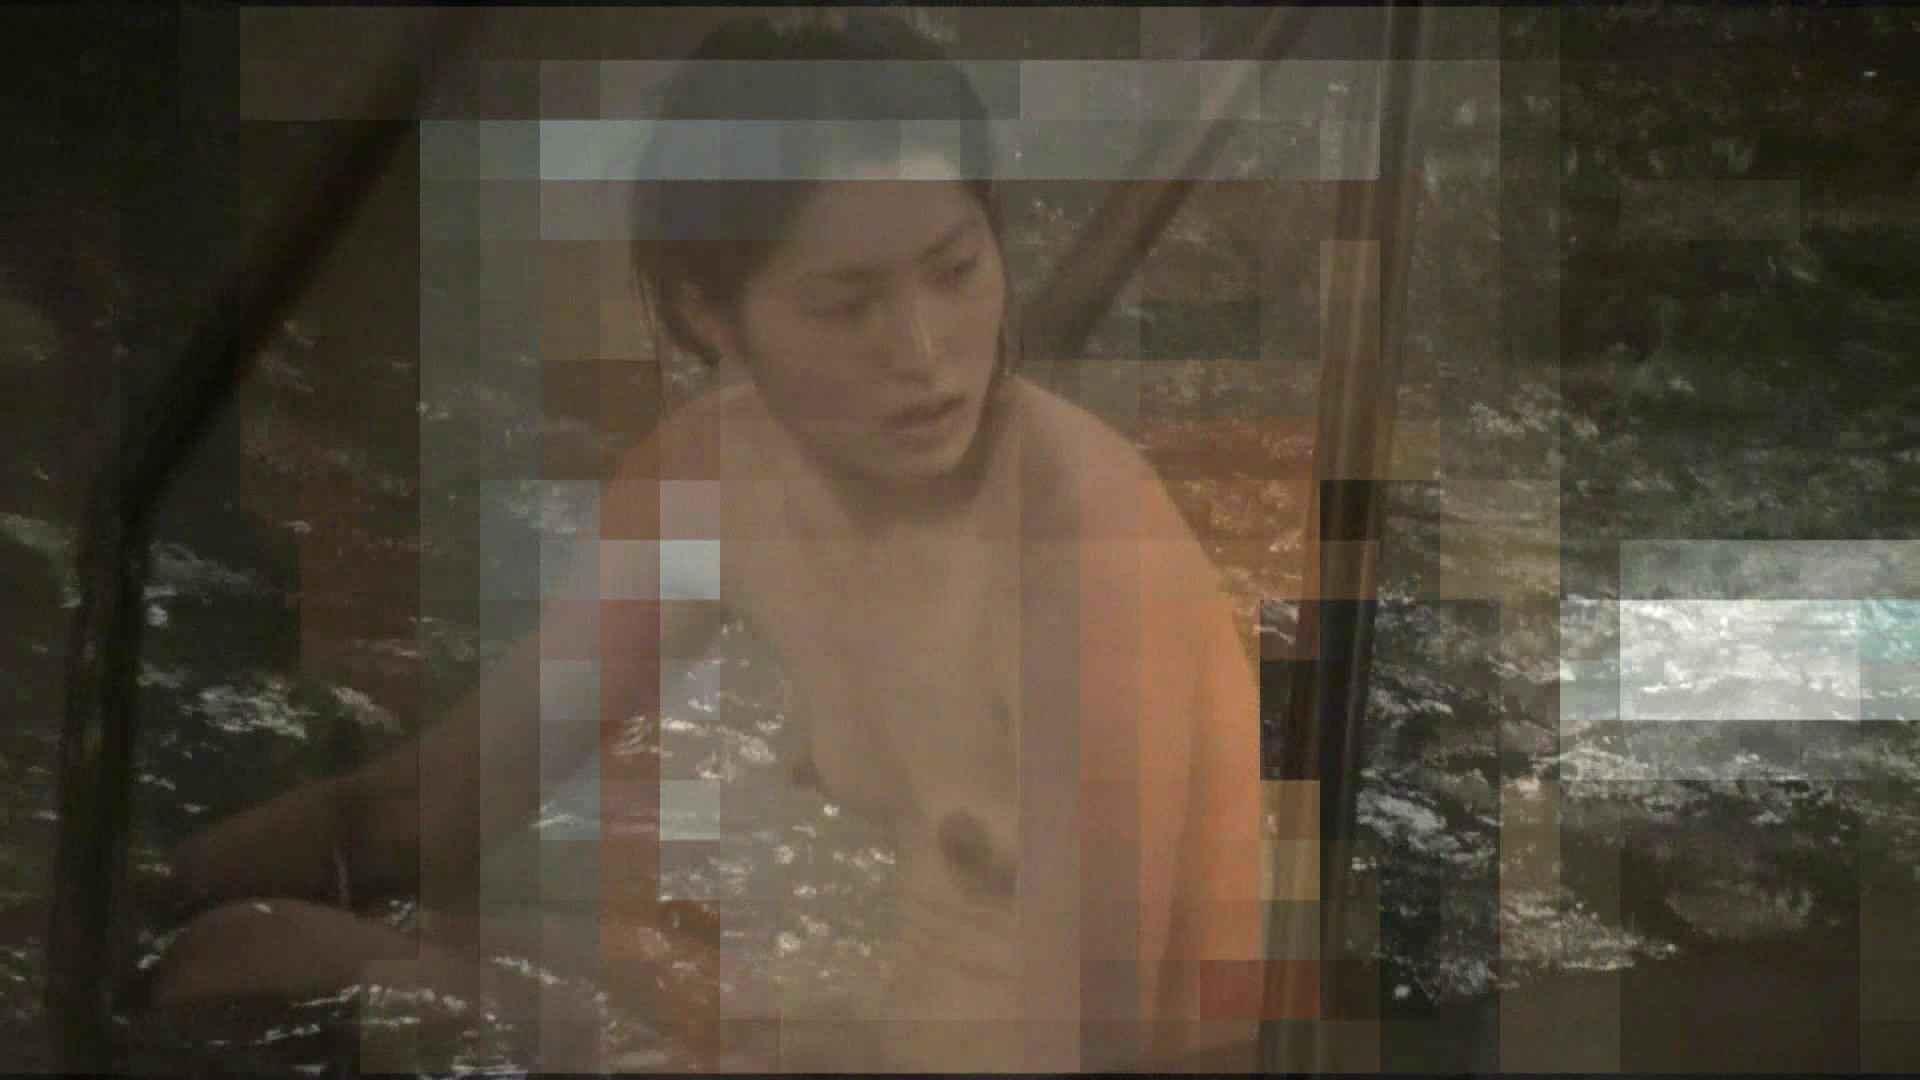 Aquaな露天風呂Vol.406 盗撮 エロ無料画像 66連発 17